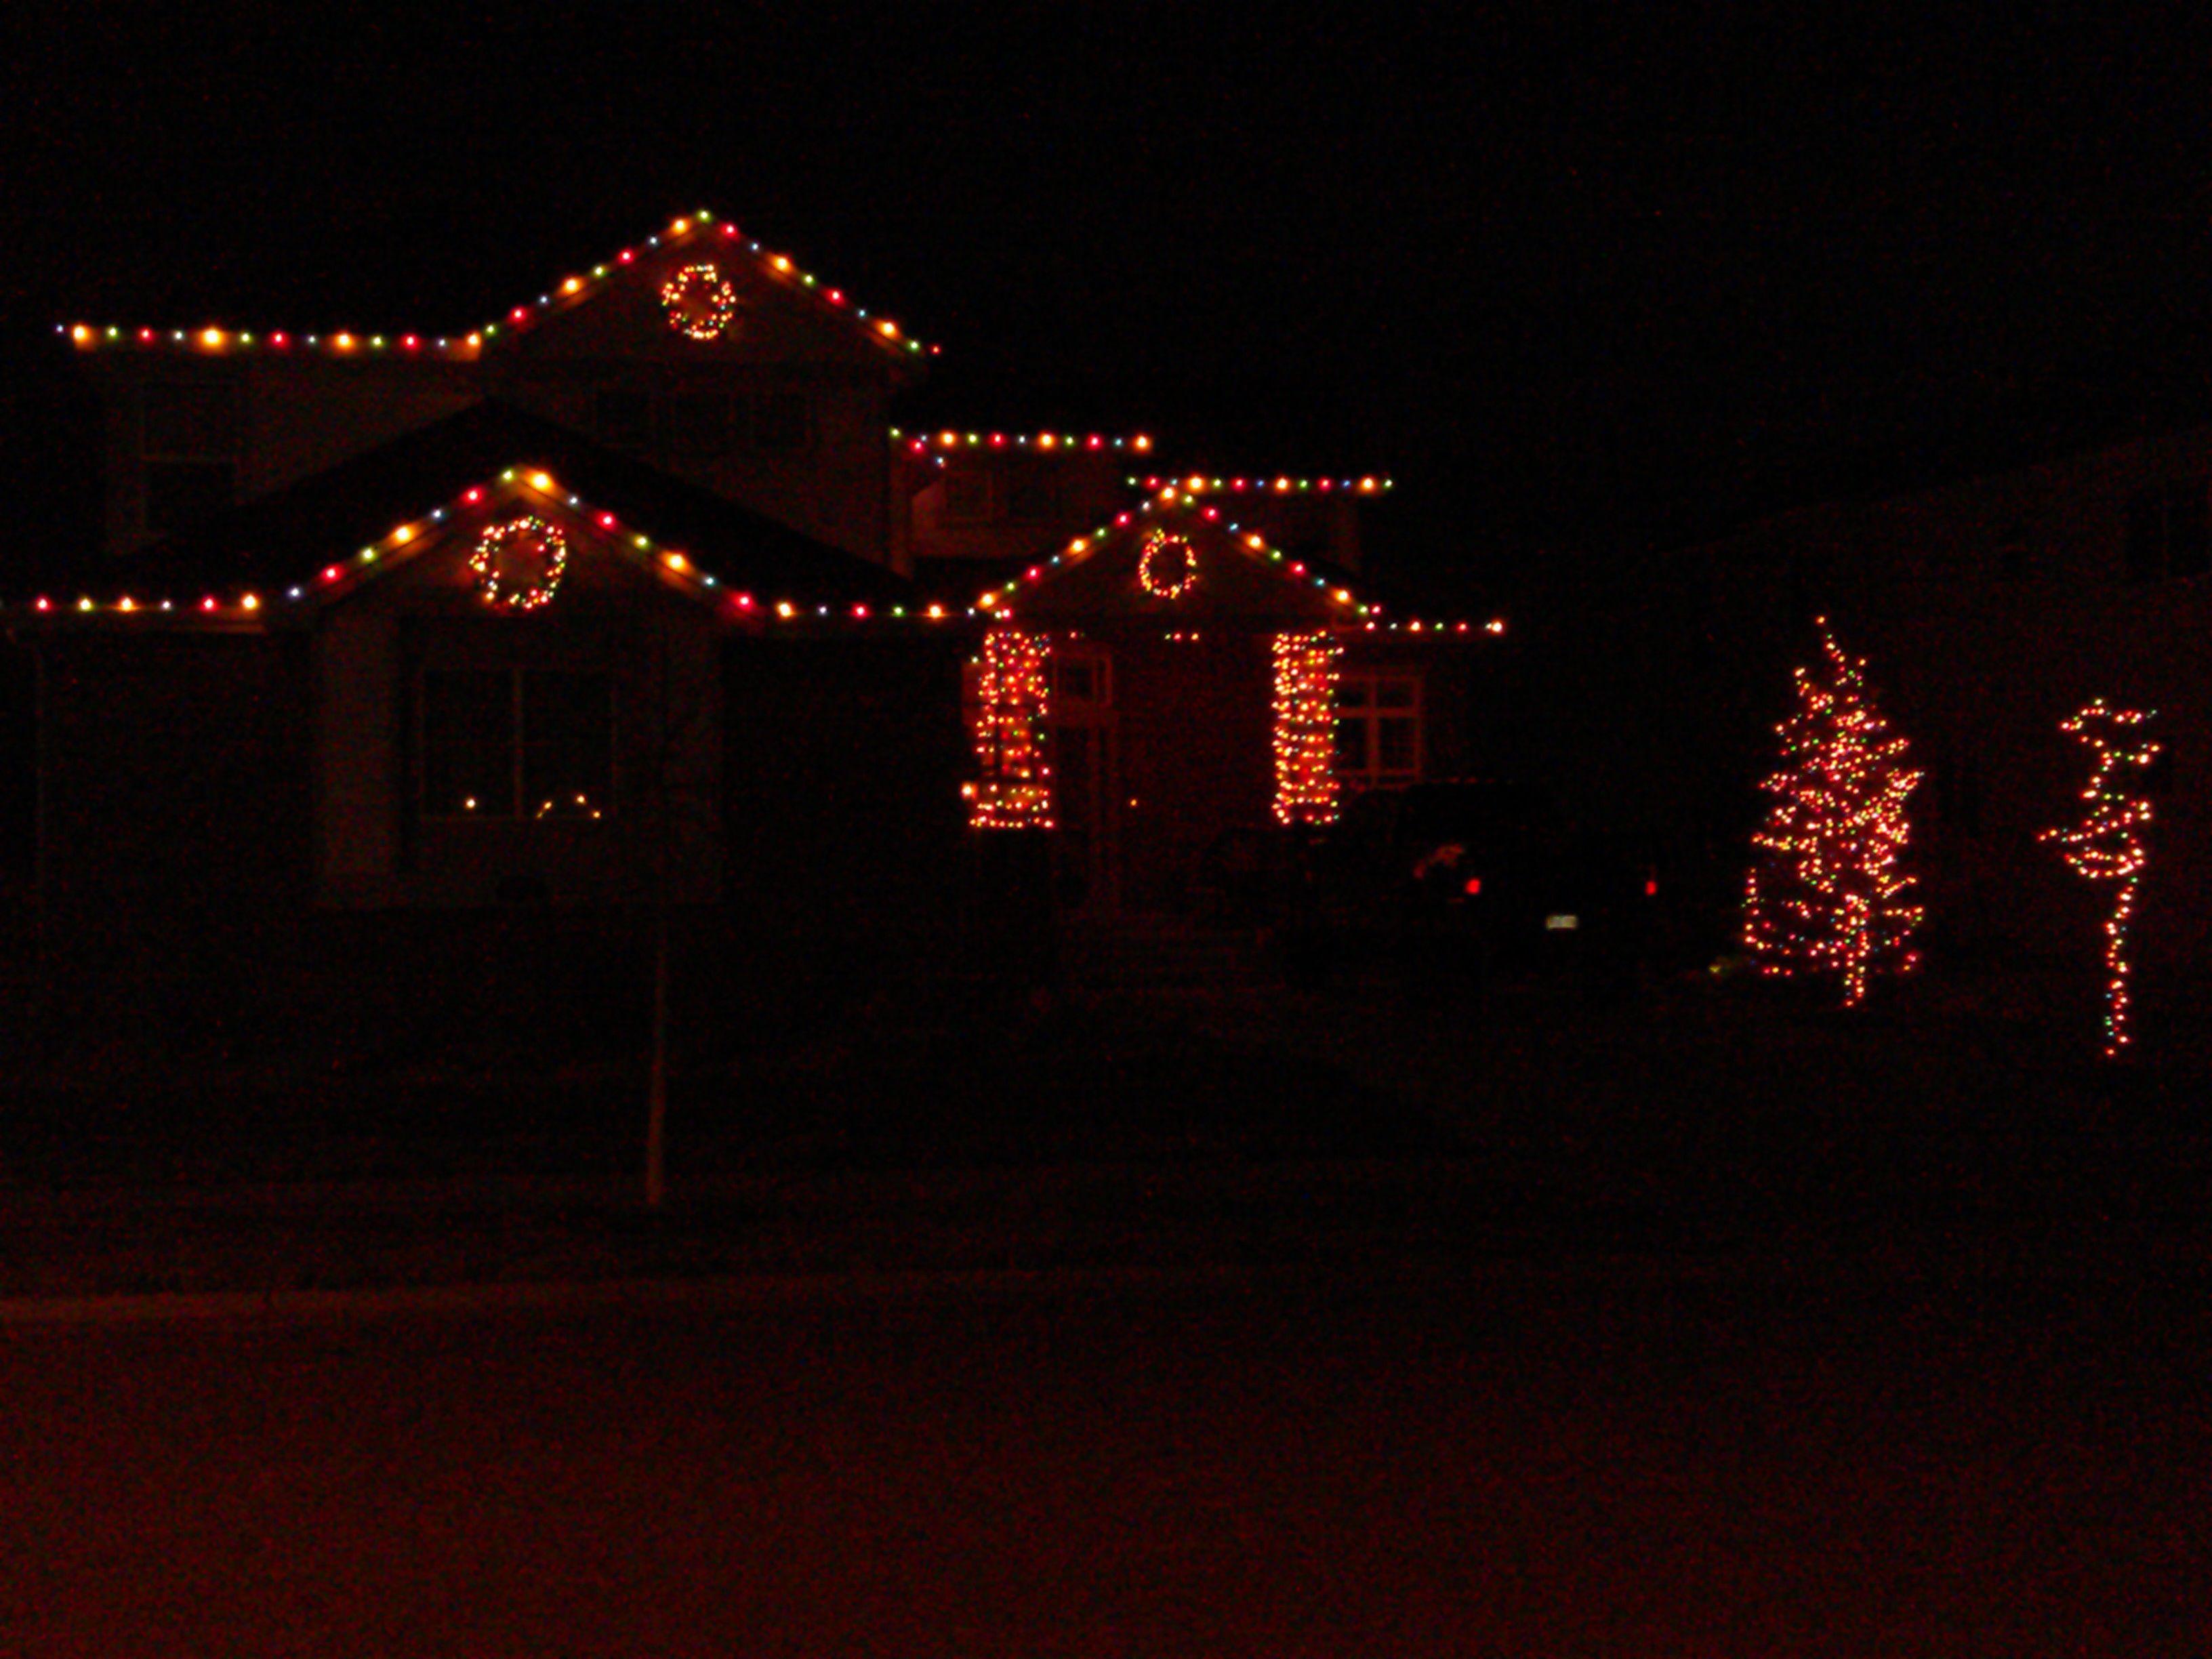 Saddlerock, CO Residence, Multi-color lights on house, 3 ...